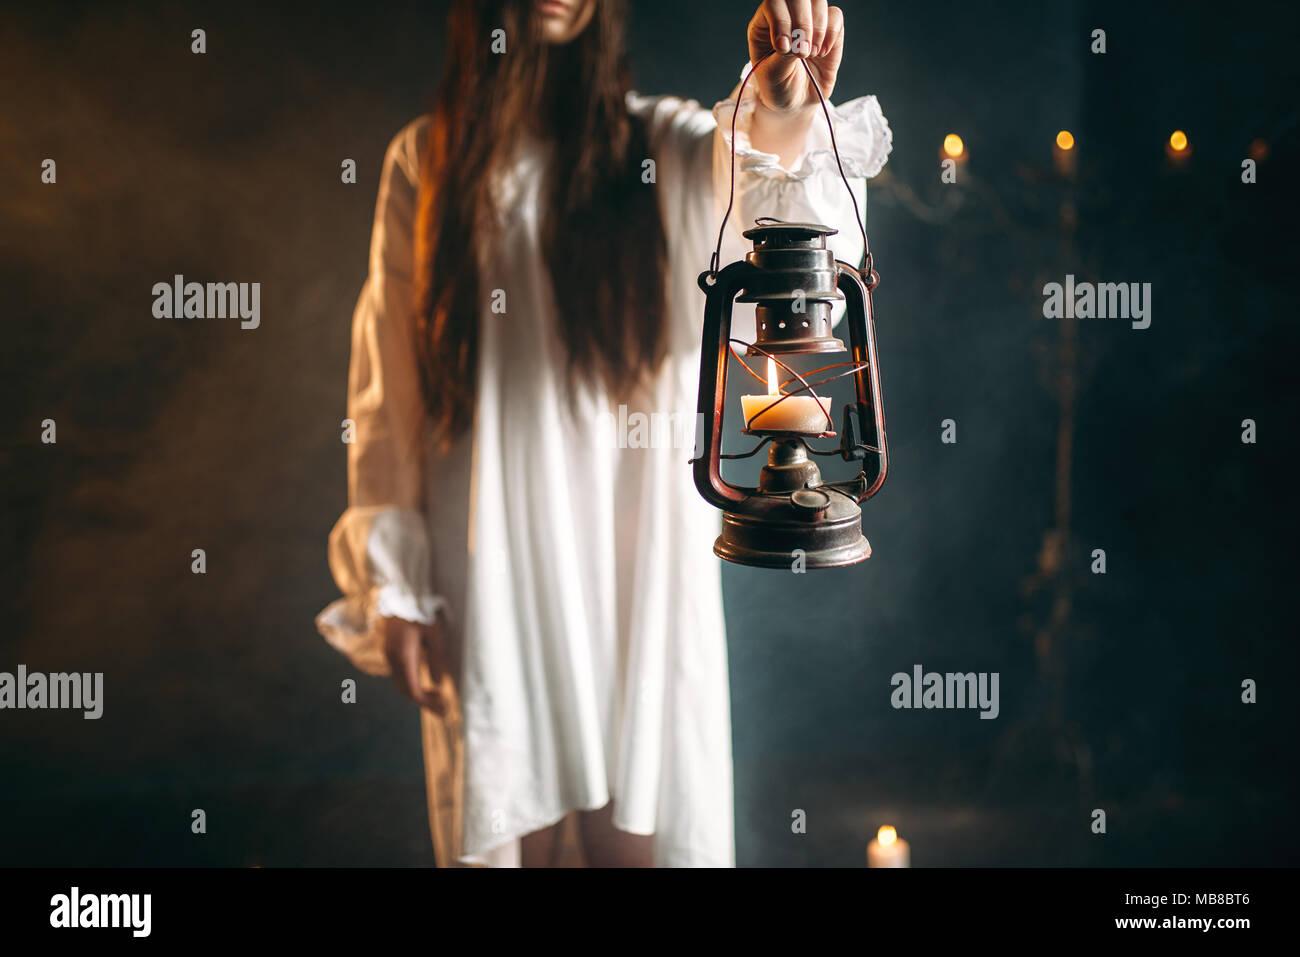 Female person in white shirt holds kerosene lamp in hand. Dark magic ritual, occult and exorcism - Stock Image